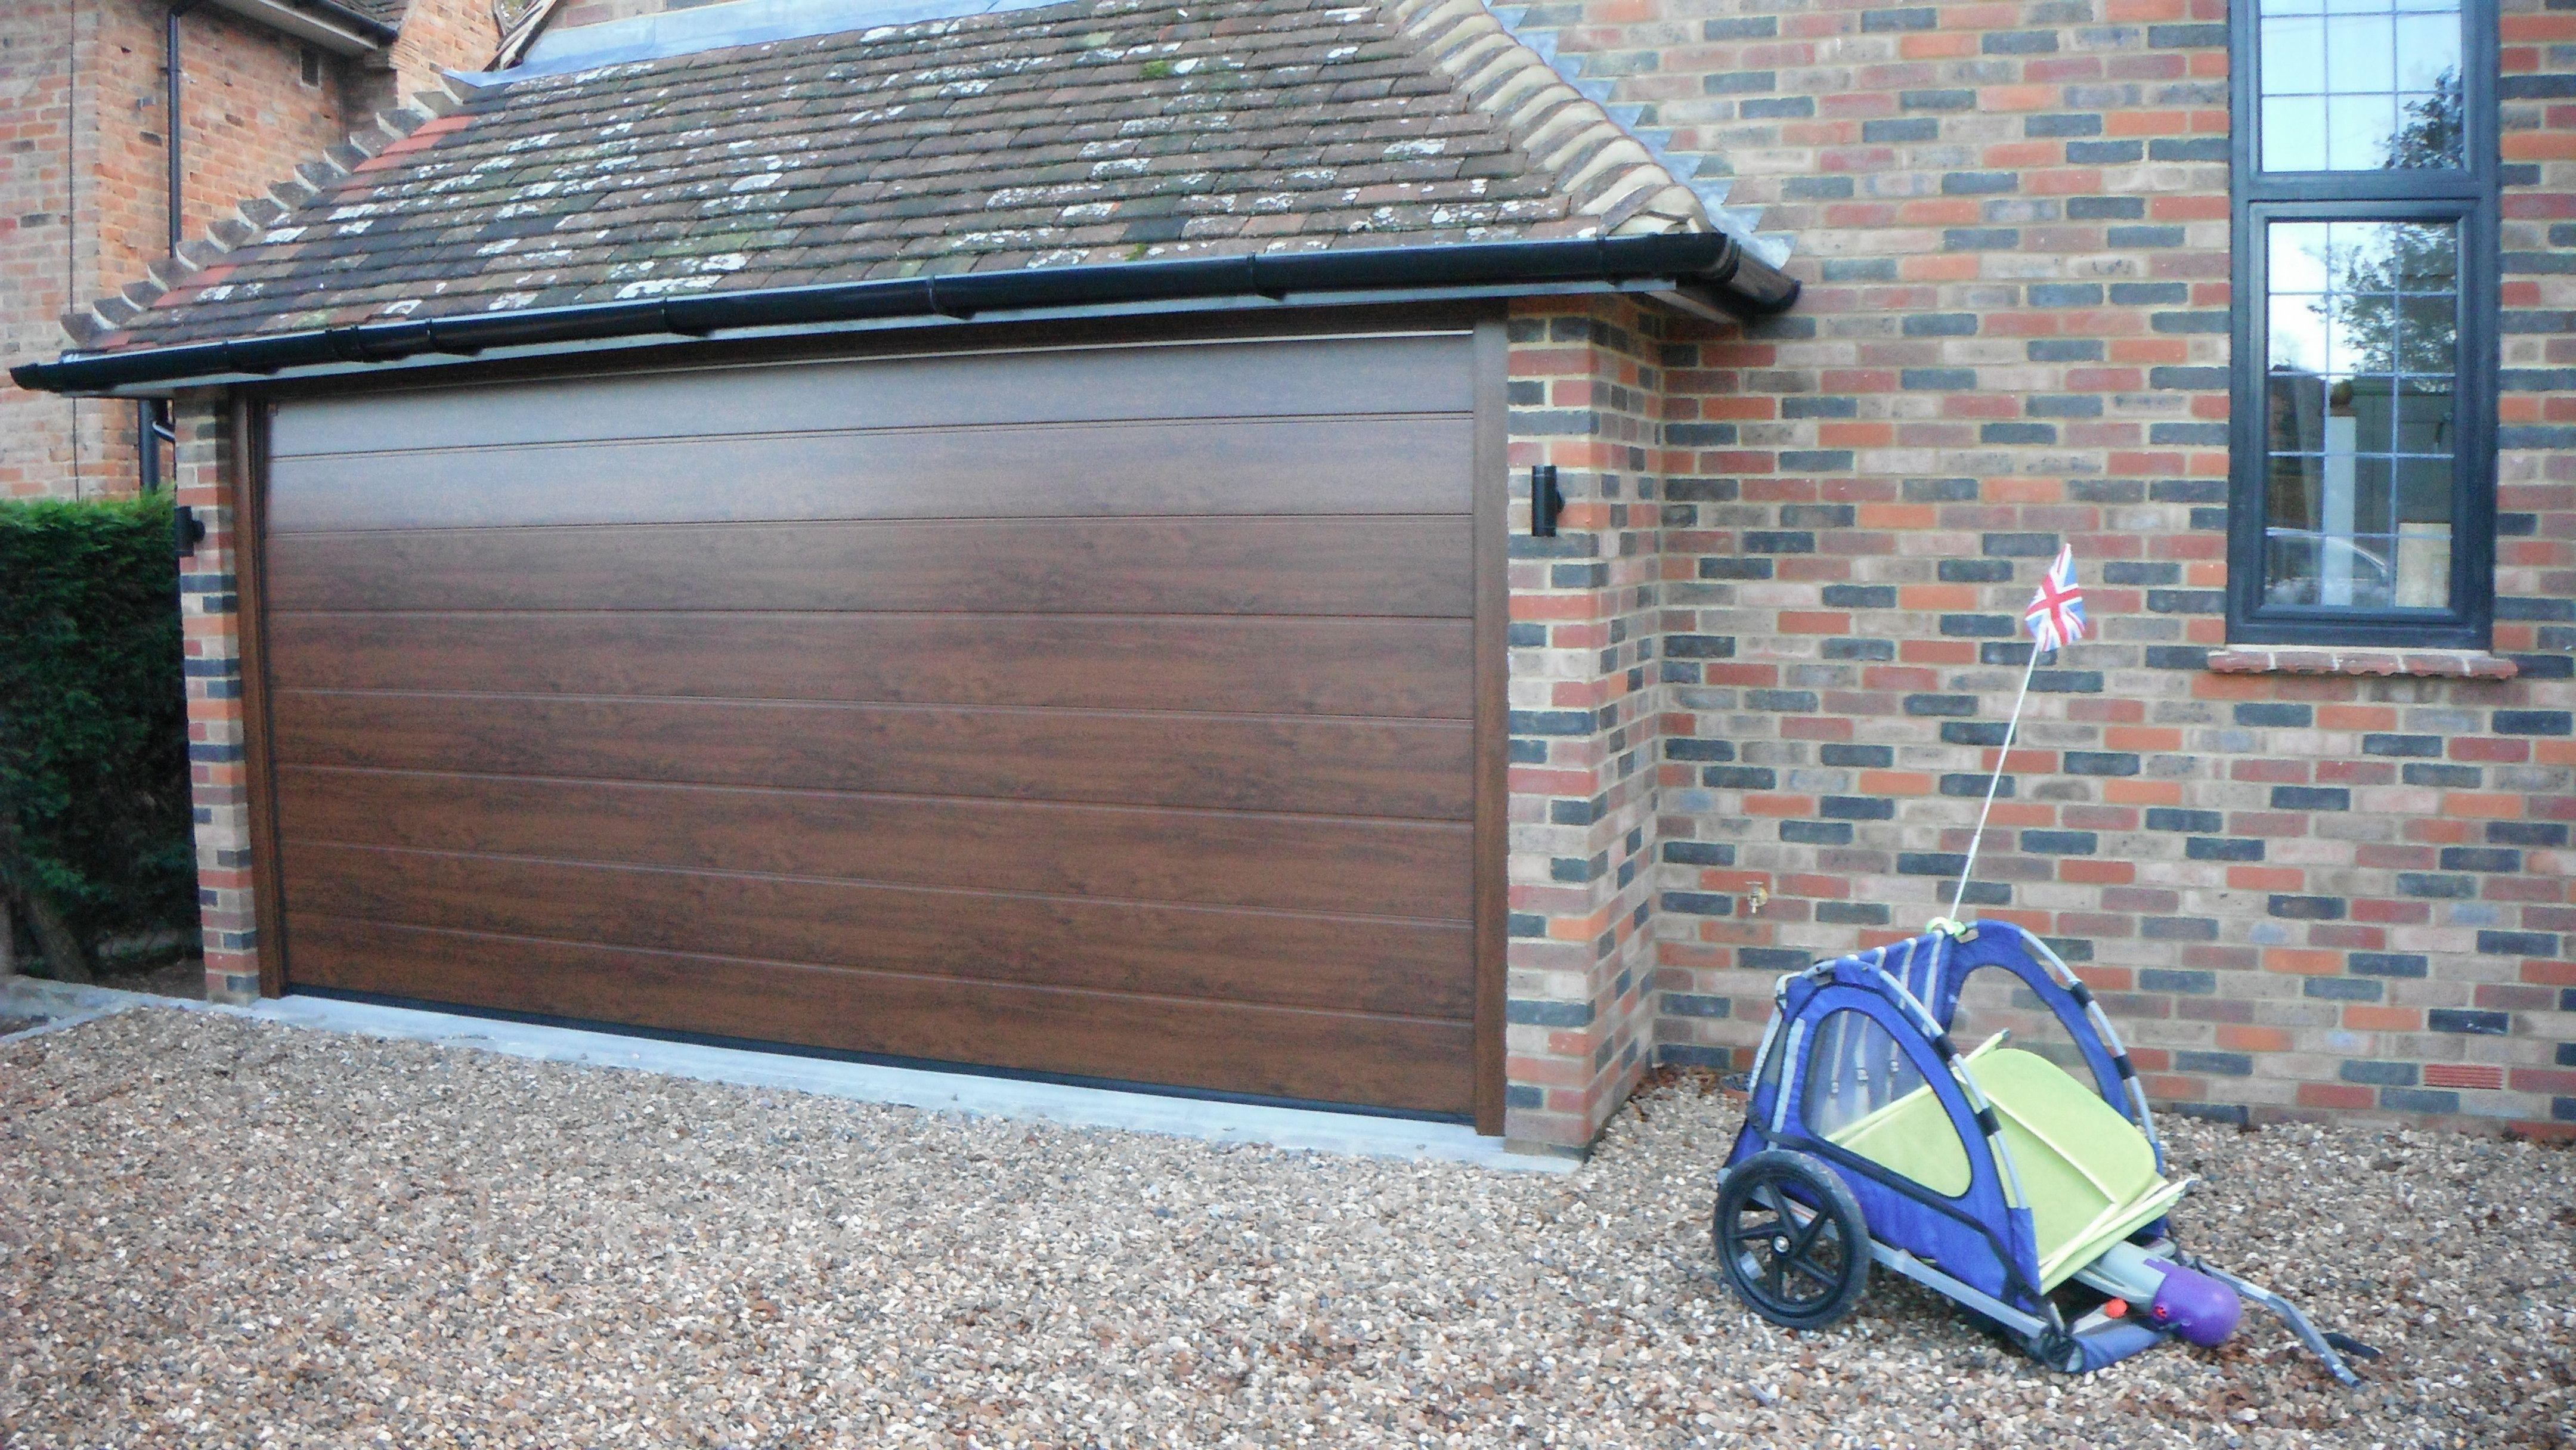 clopay replacement ideas coil spring garage brighton opener er instructions installation rich mercial repair door